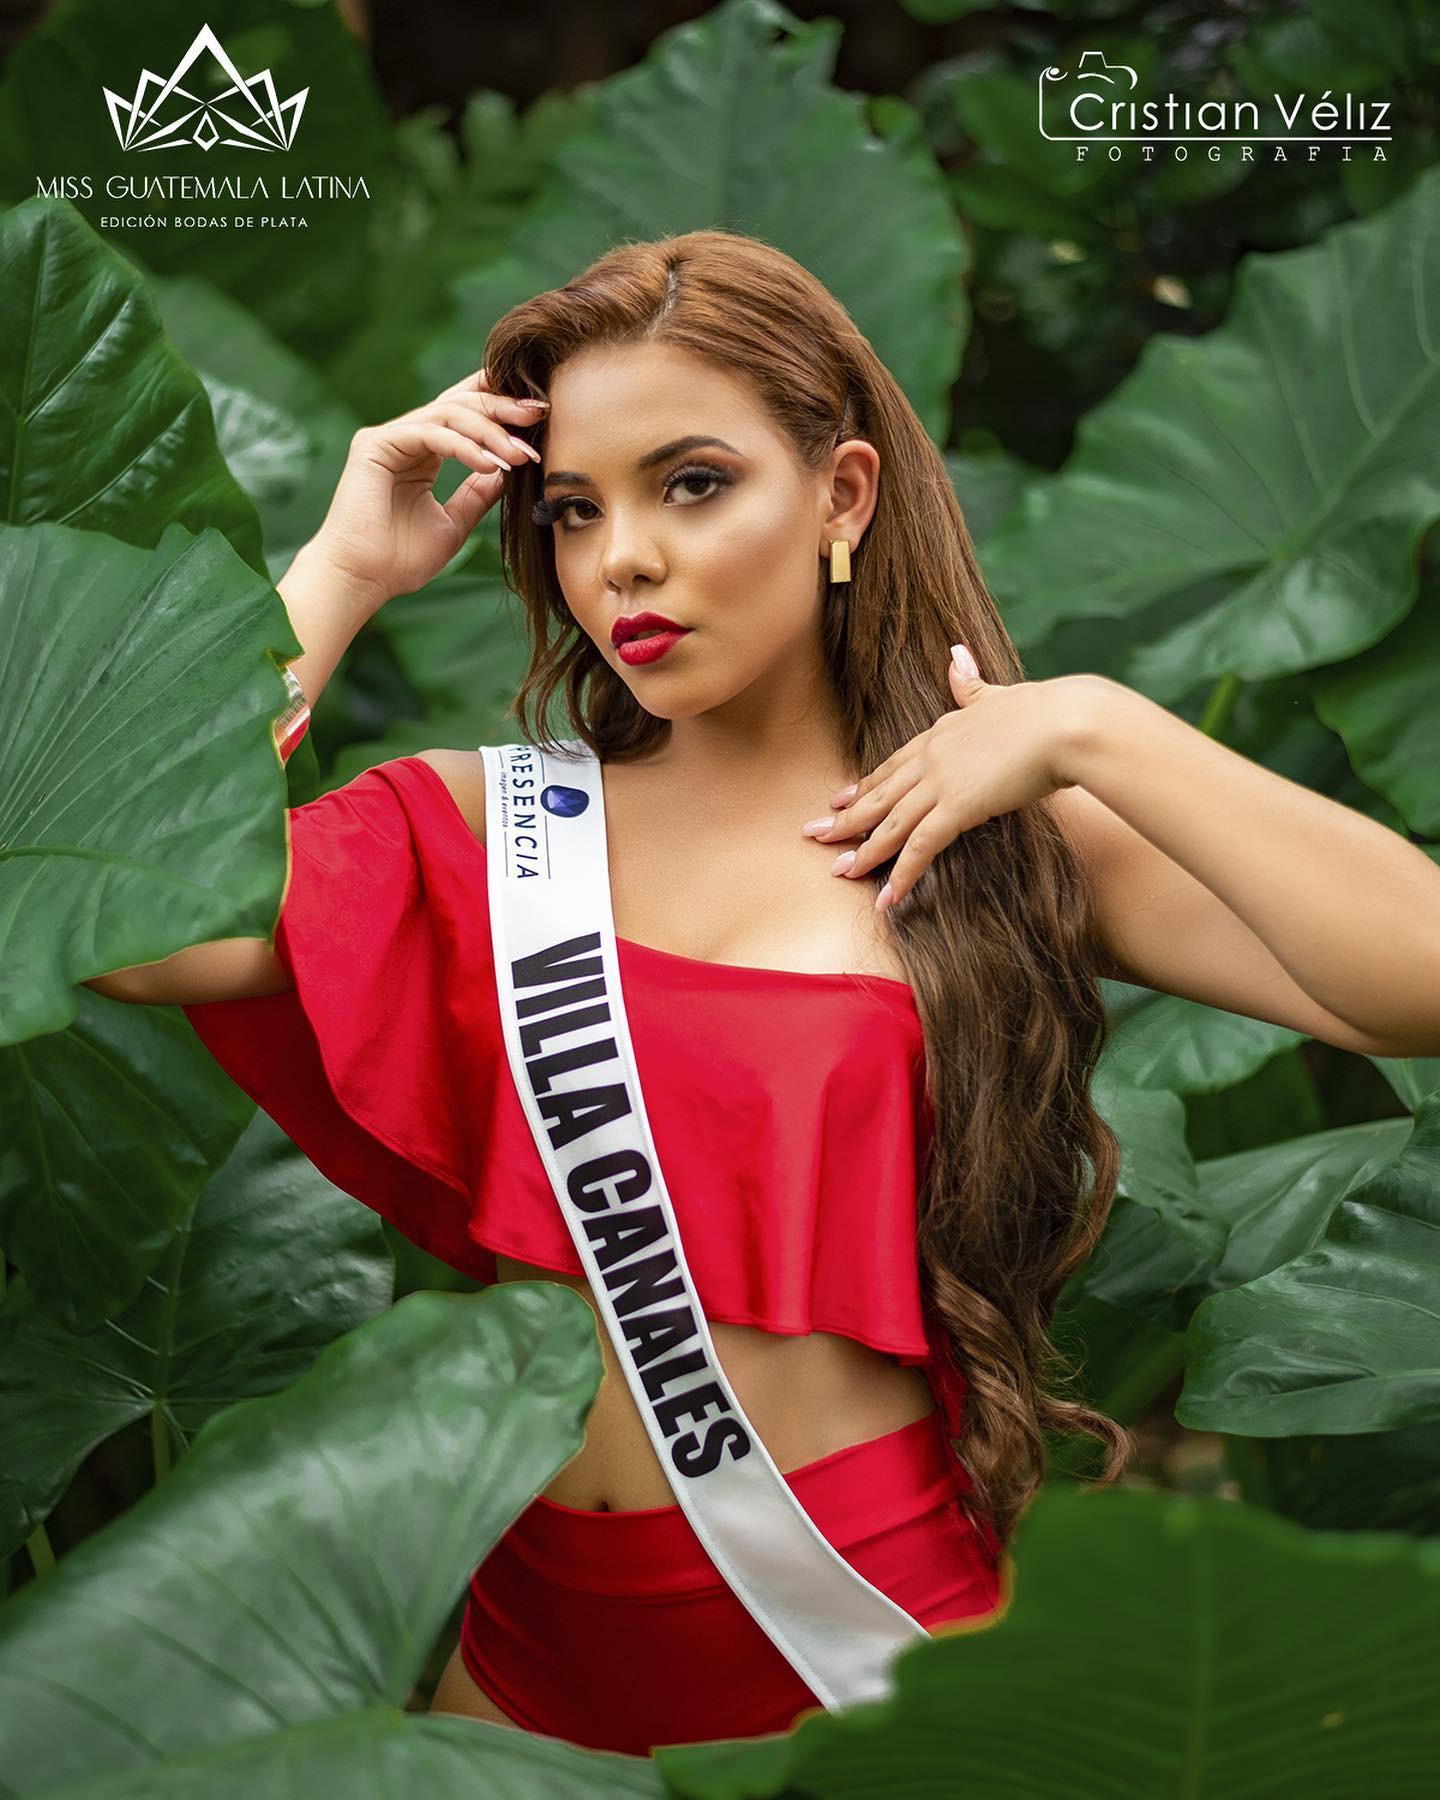 candidatas a miss guatemala latina 2021. final: 30 de abril. - Página 6 B3AZ3N